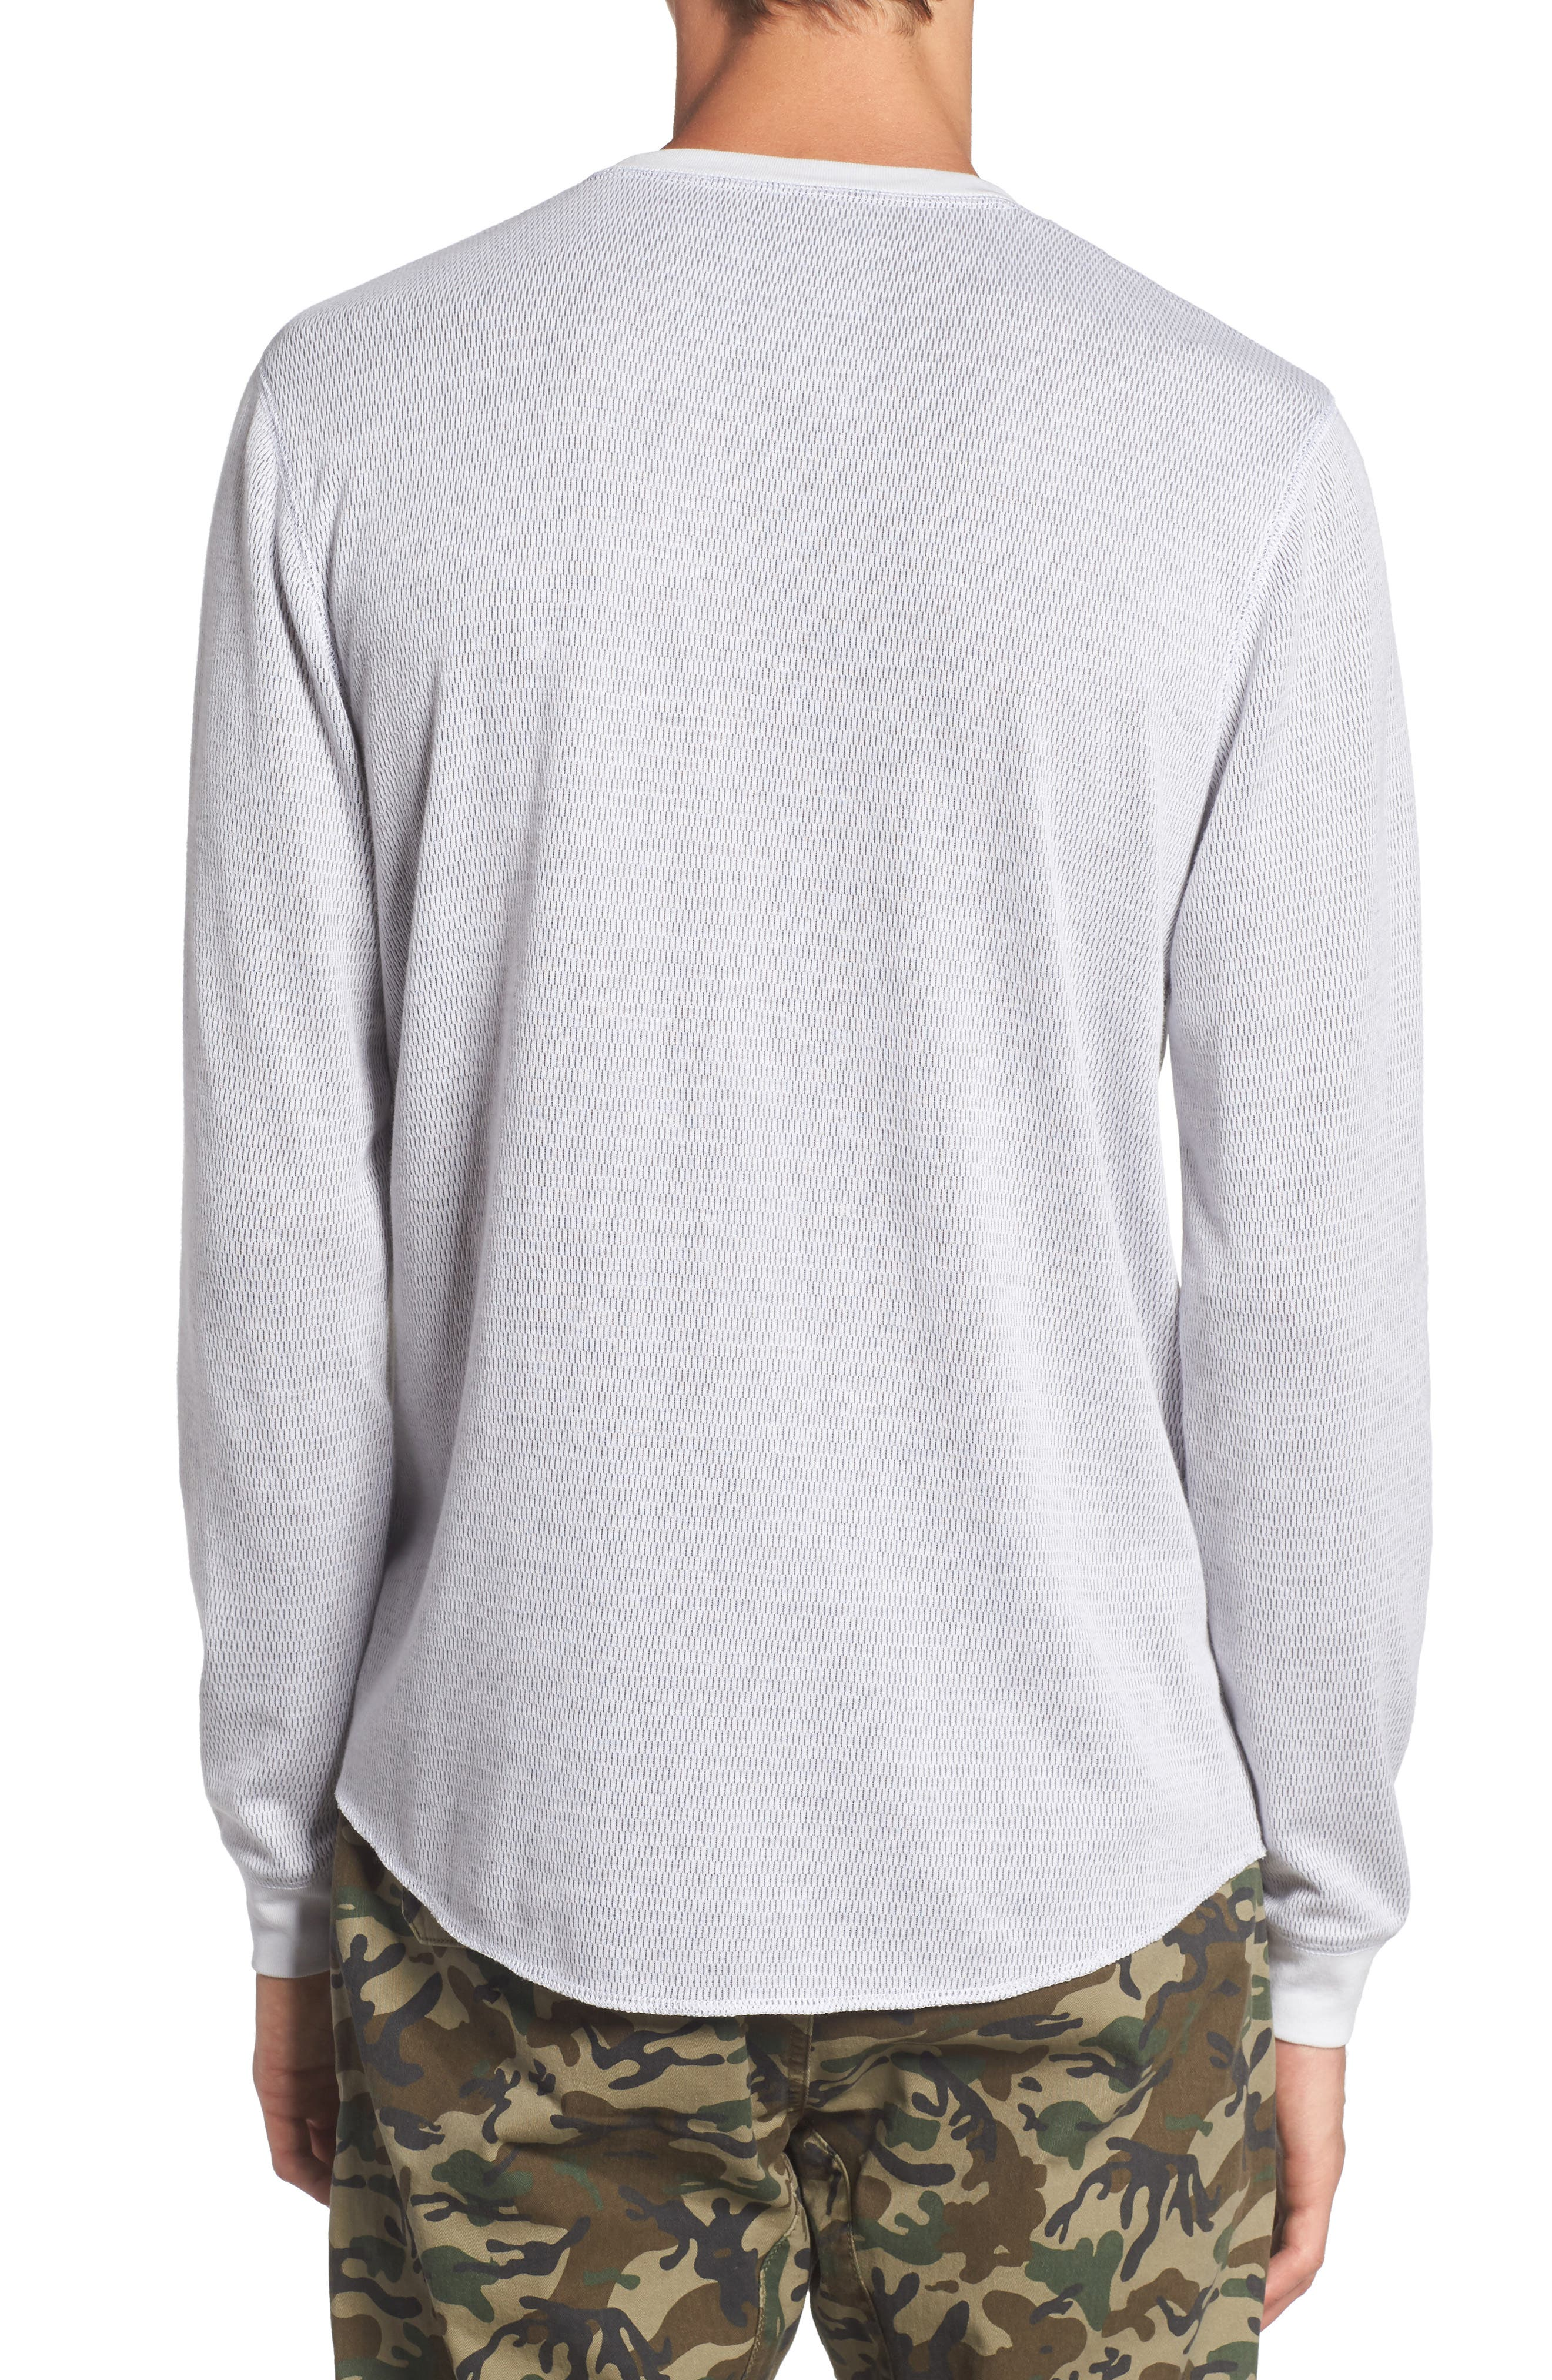 Notch Neck Thermal T-Shirt,                             Alternate thumbnail 10, color,